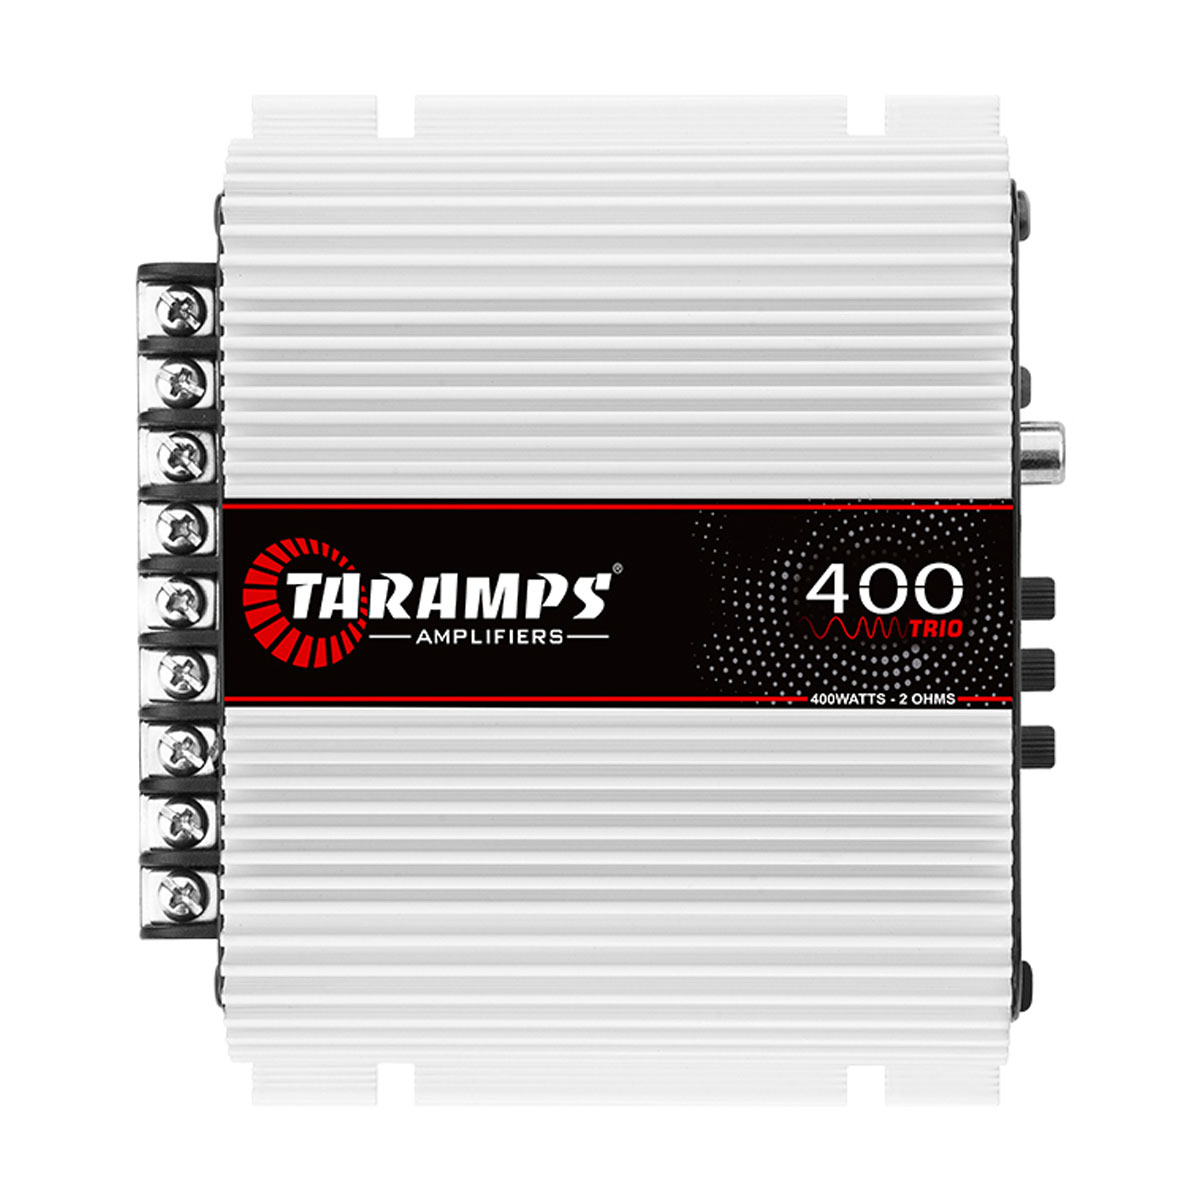 Modulo Amplificador Taramps D 400 Trio 3 Canais 400W 2Ohms